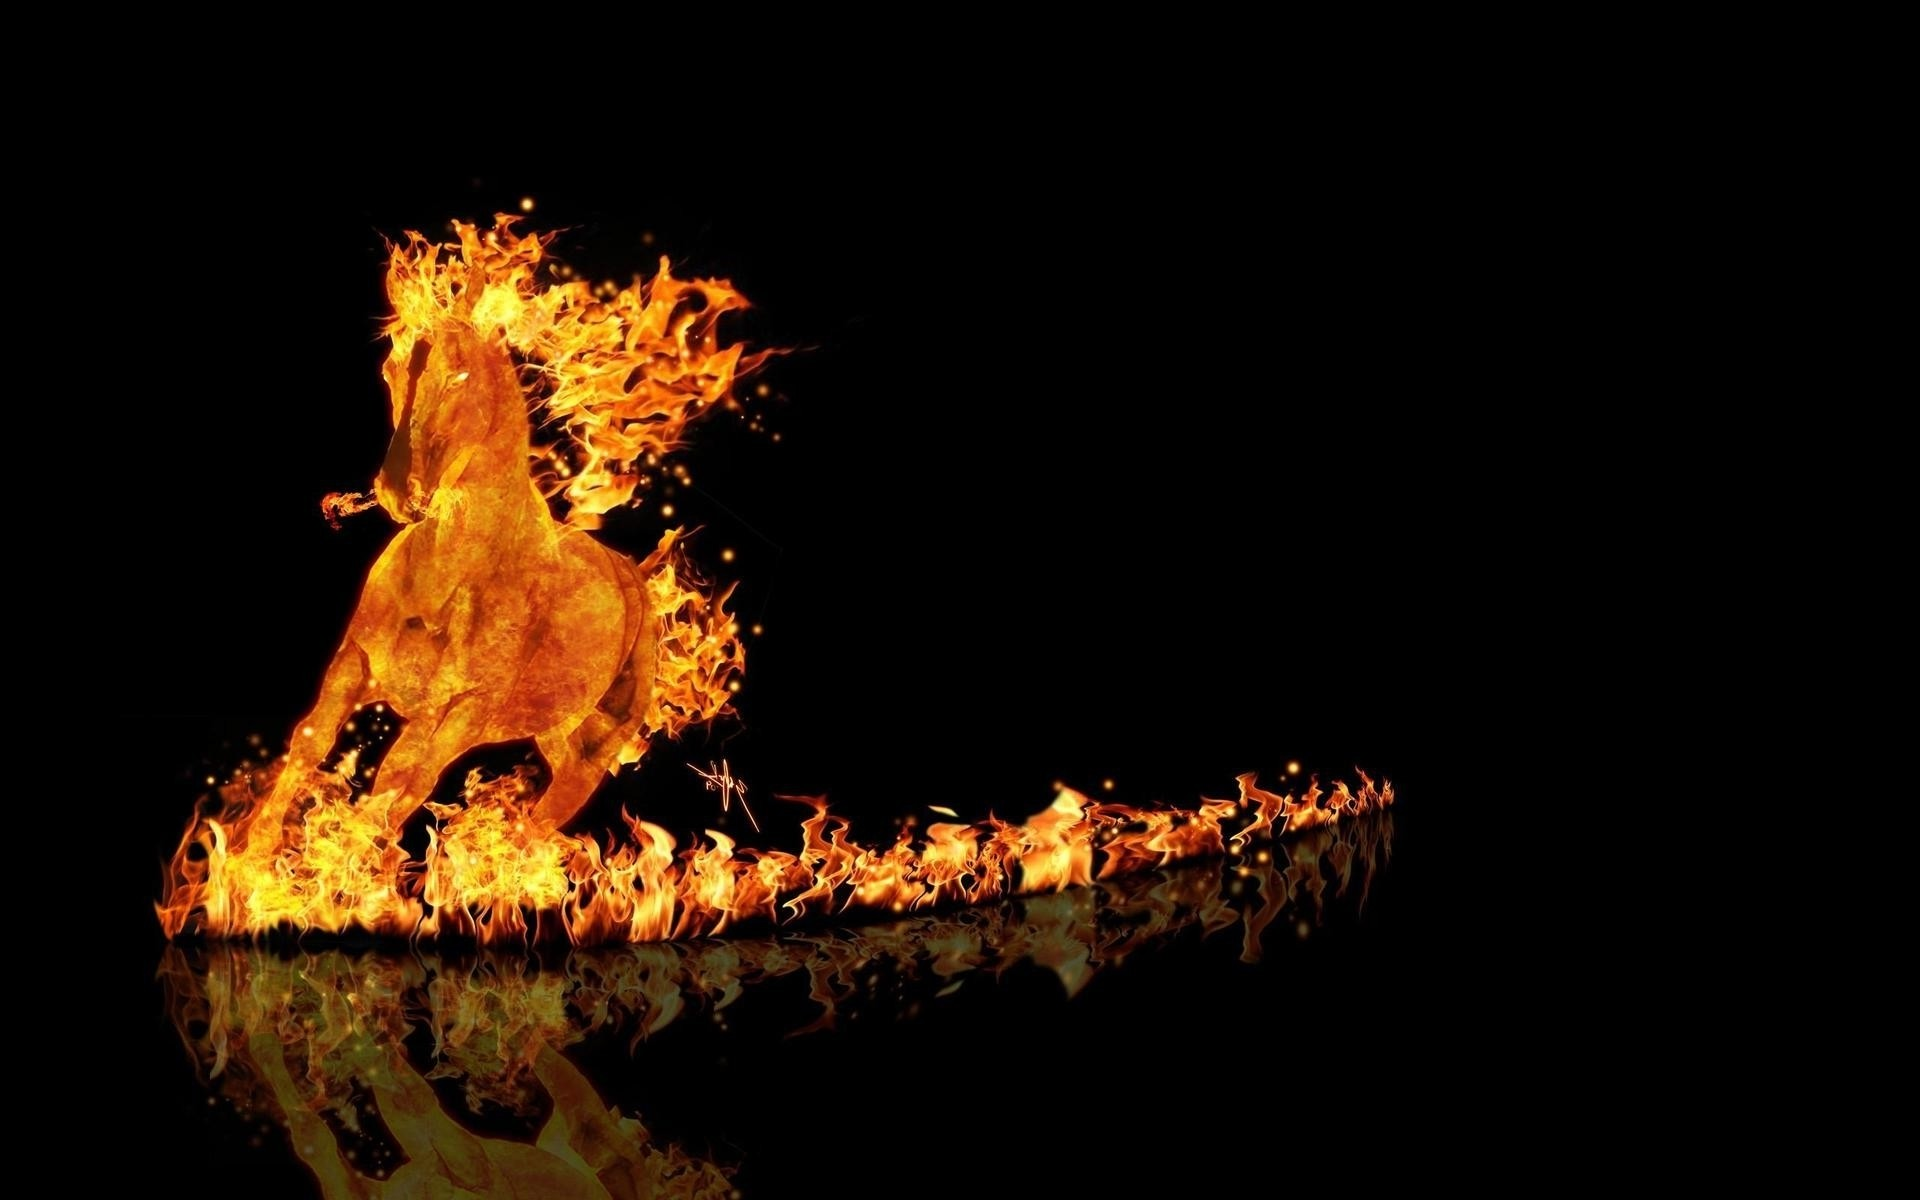 animated fire desktop wallpaper 51 images